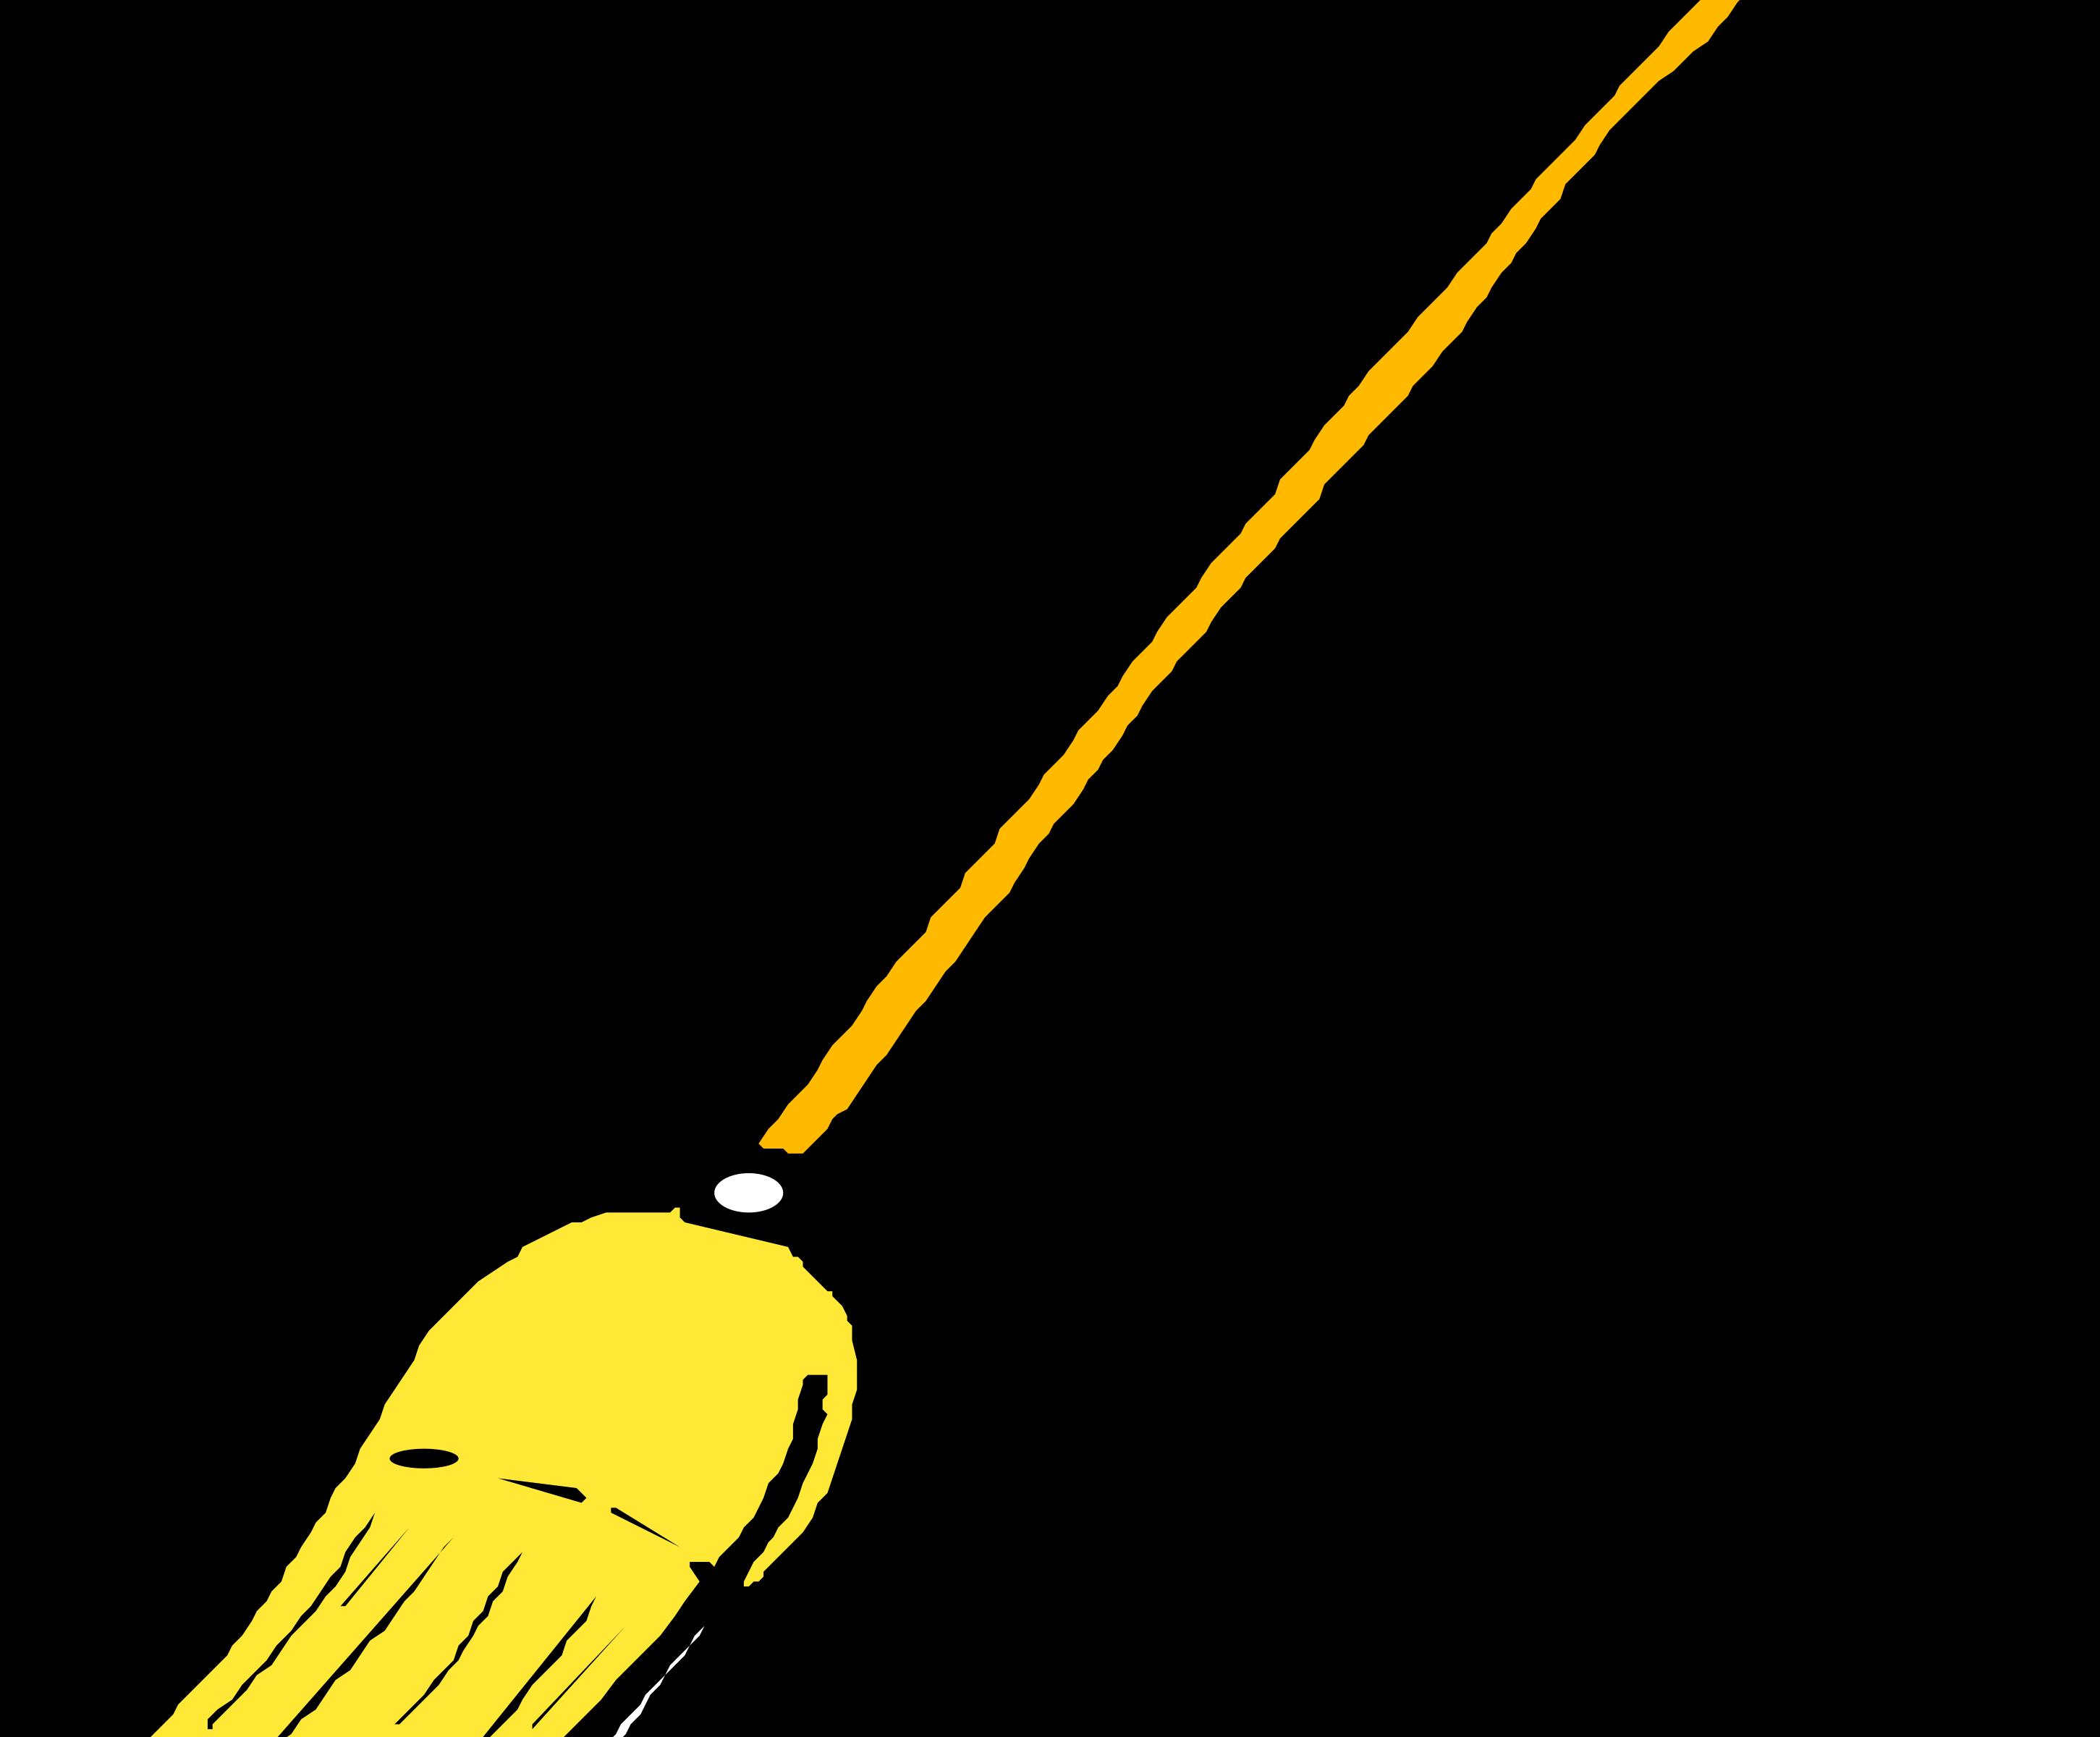 png free stock Broom clipart chore. Big image png.